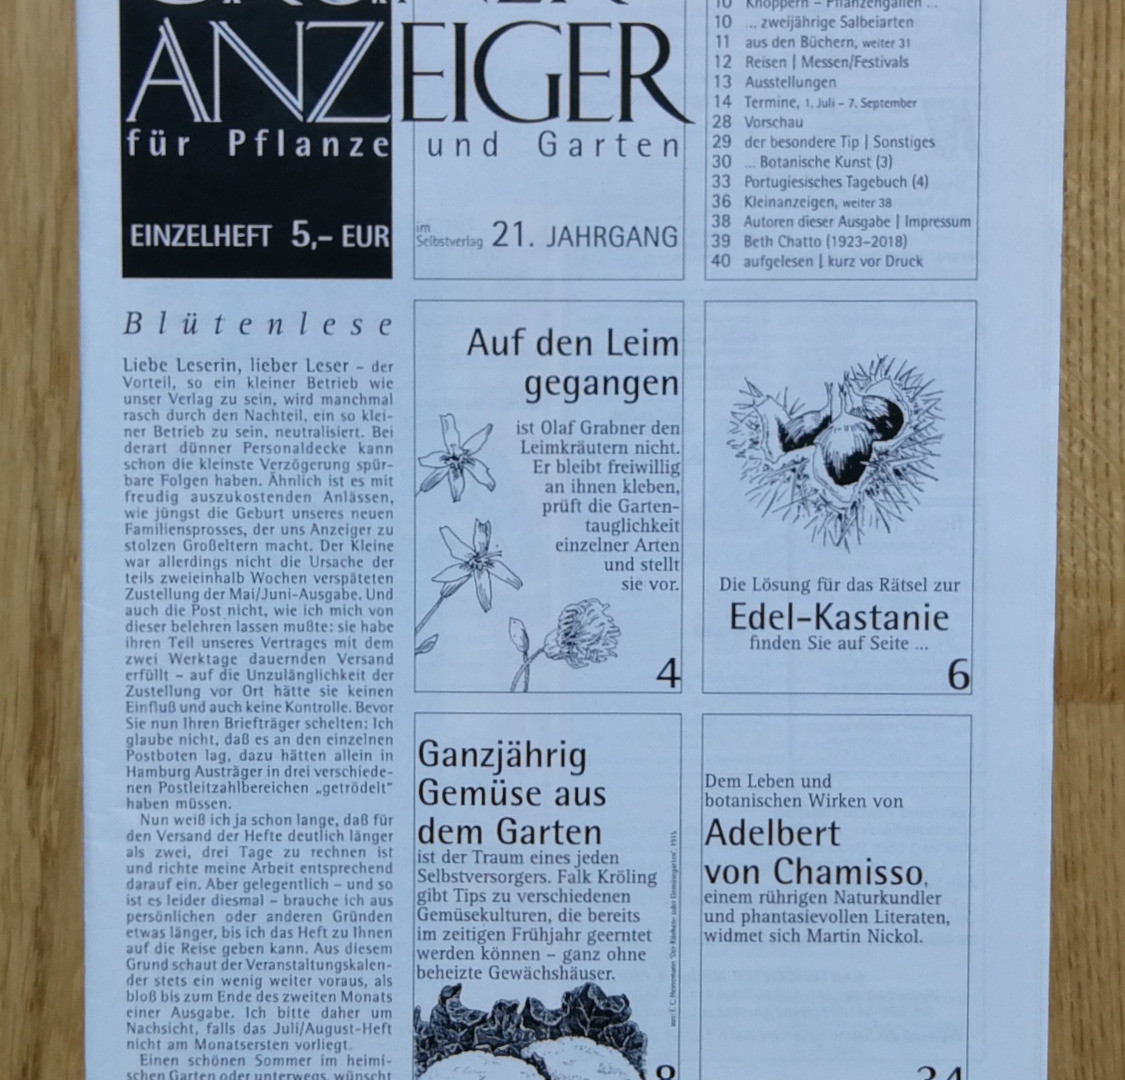 Grüner Anzeiger, 07/08 2018